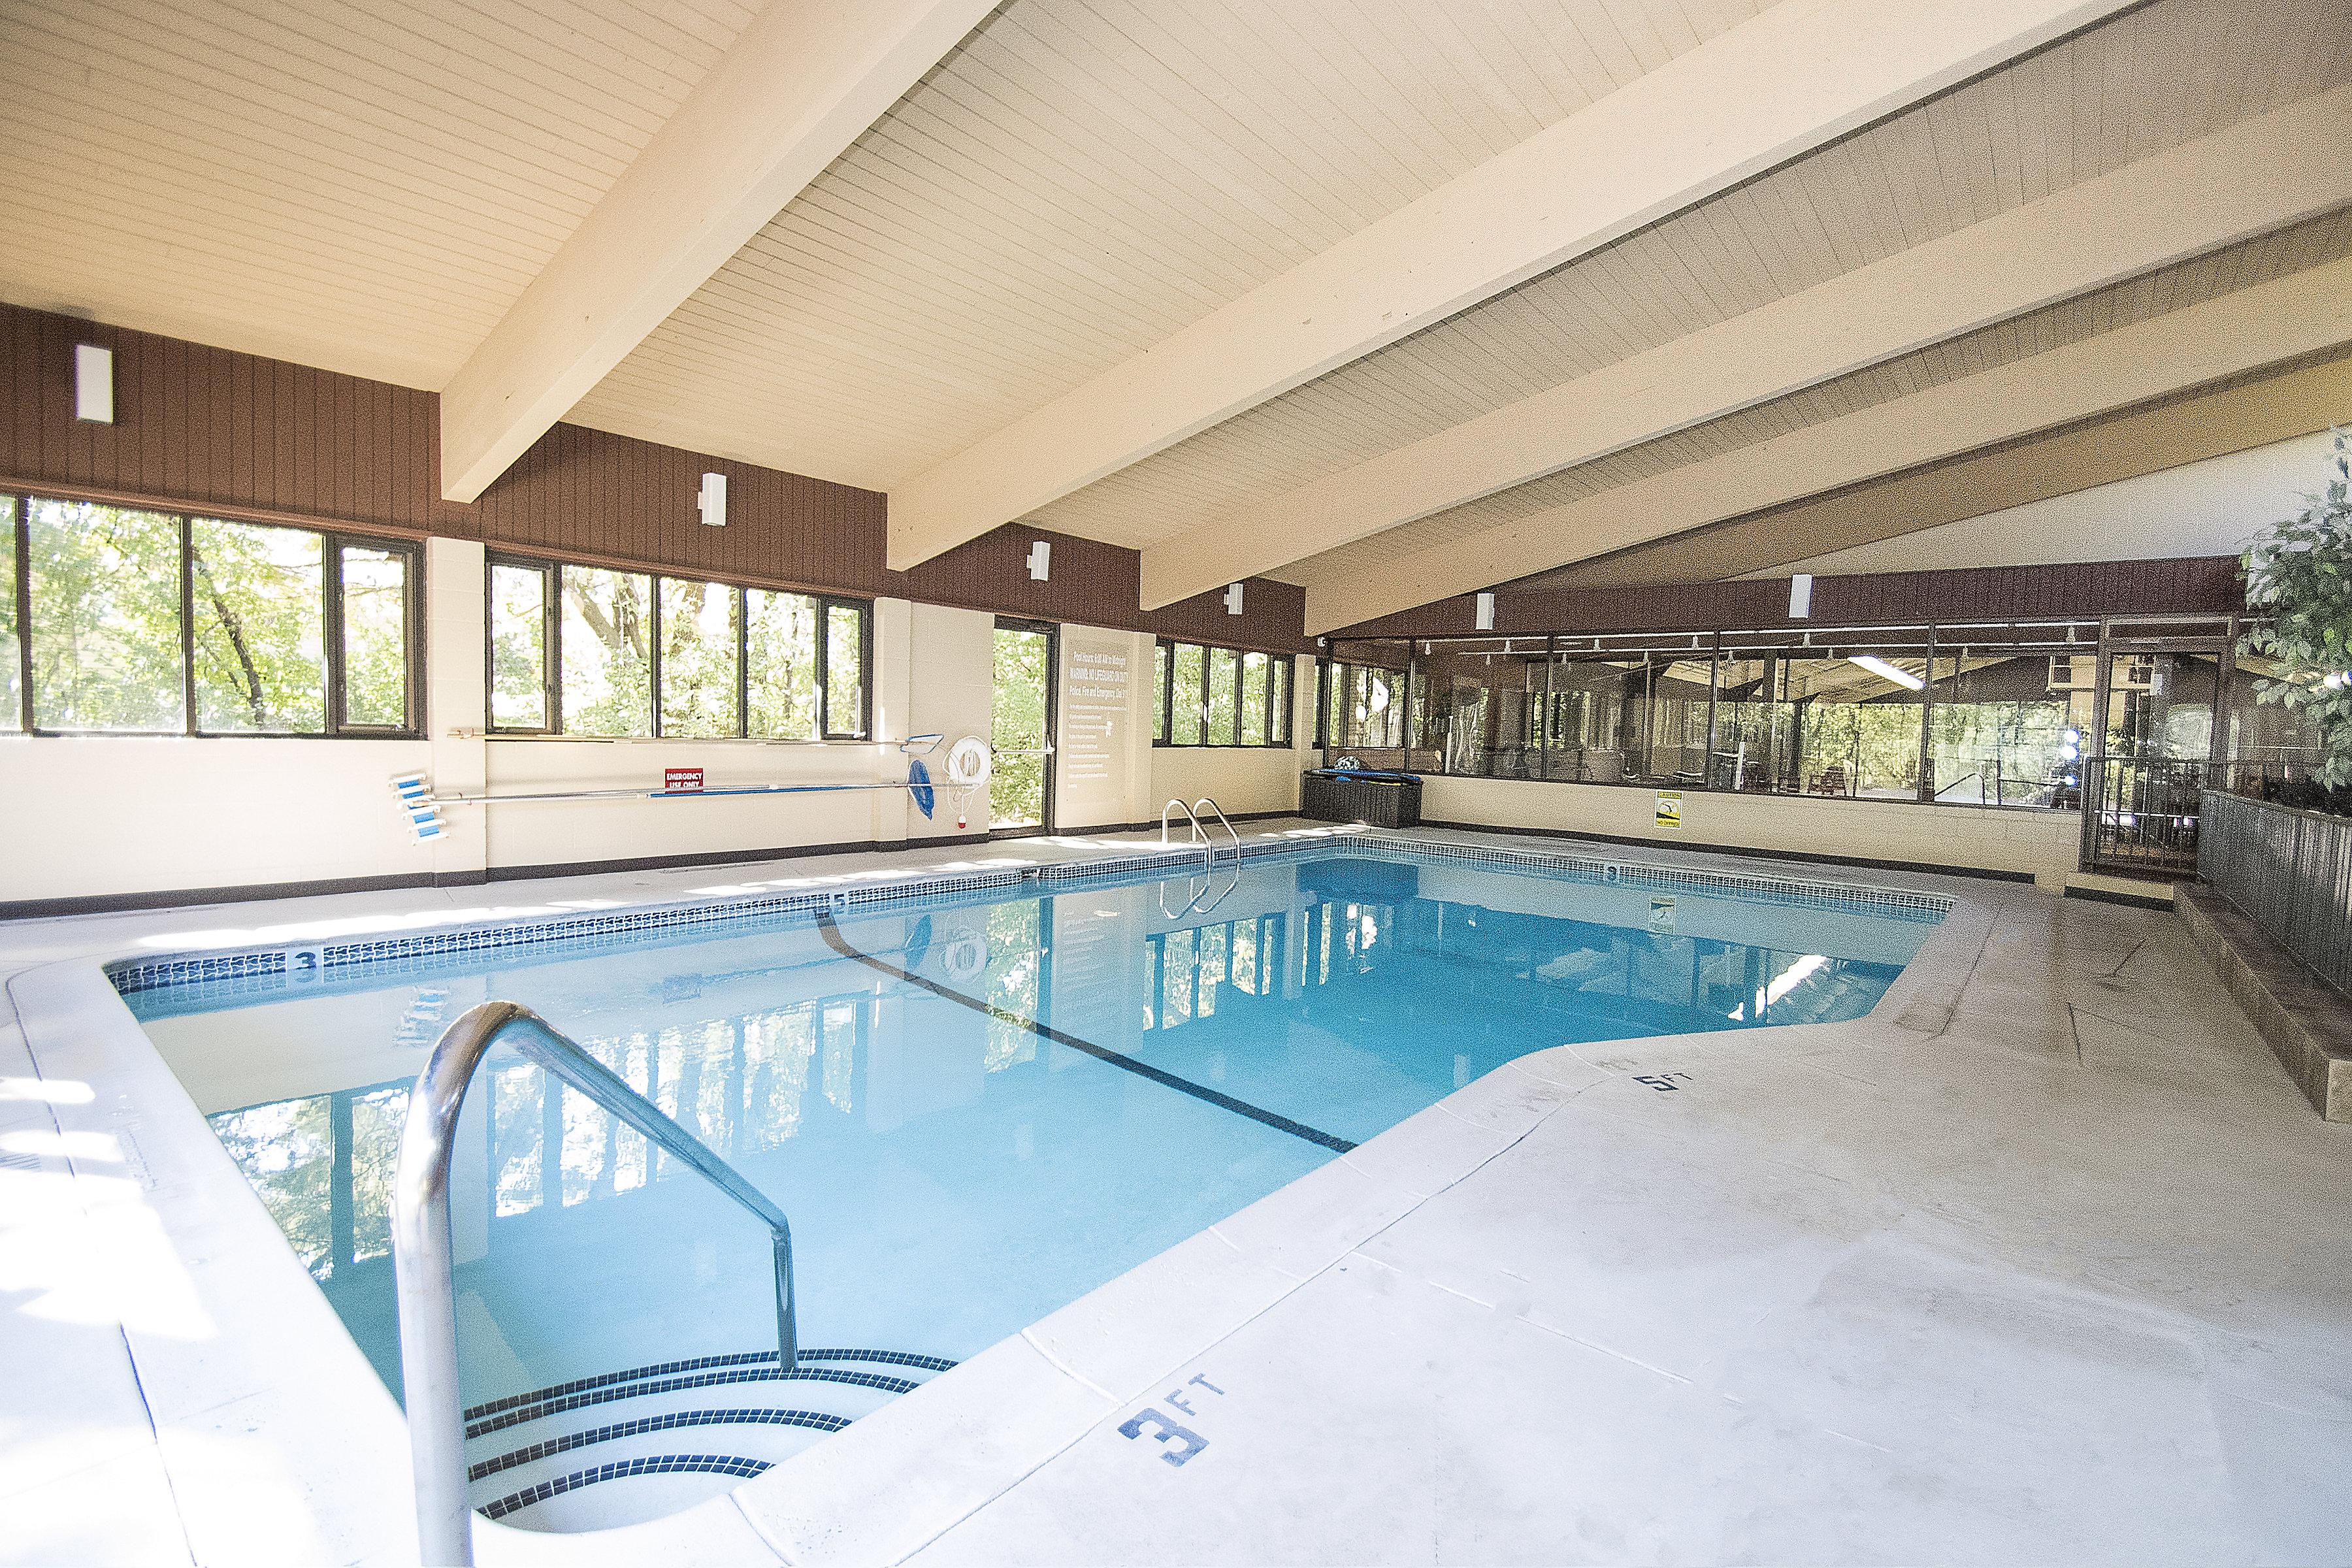 Edina West Indoor Swimming Pool